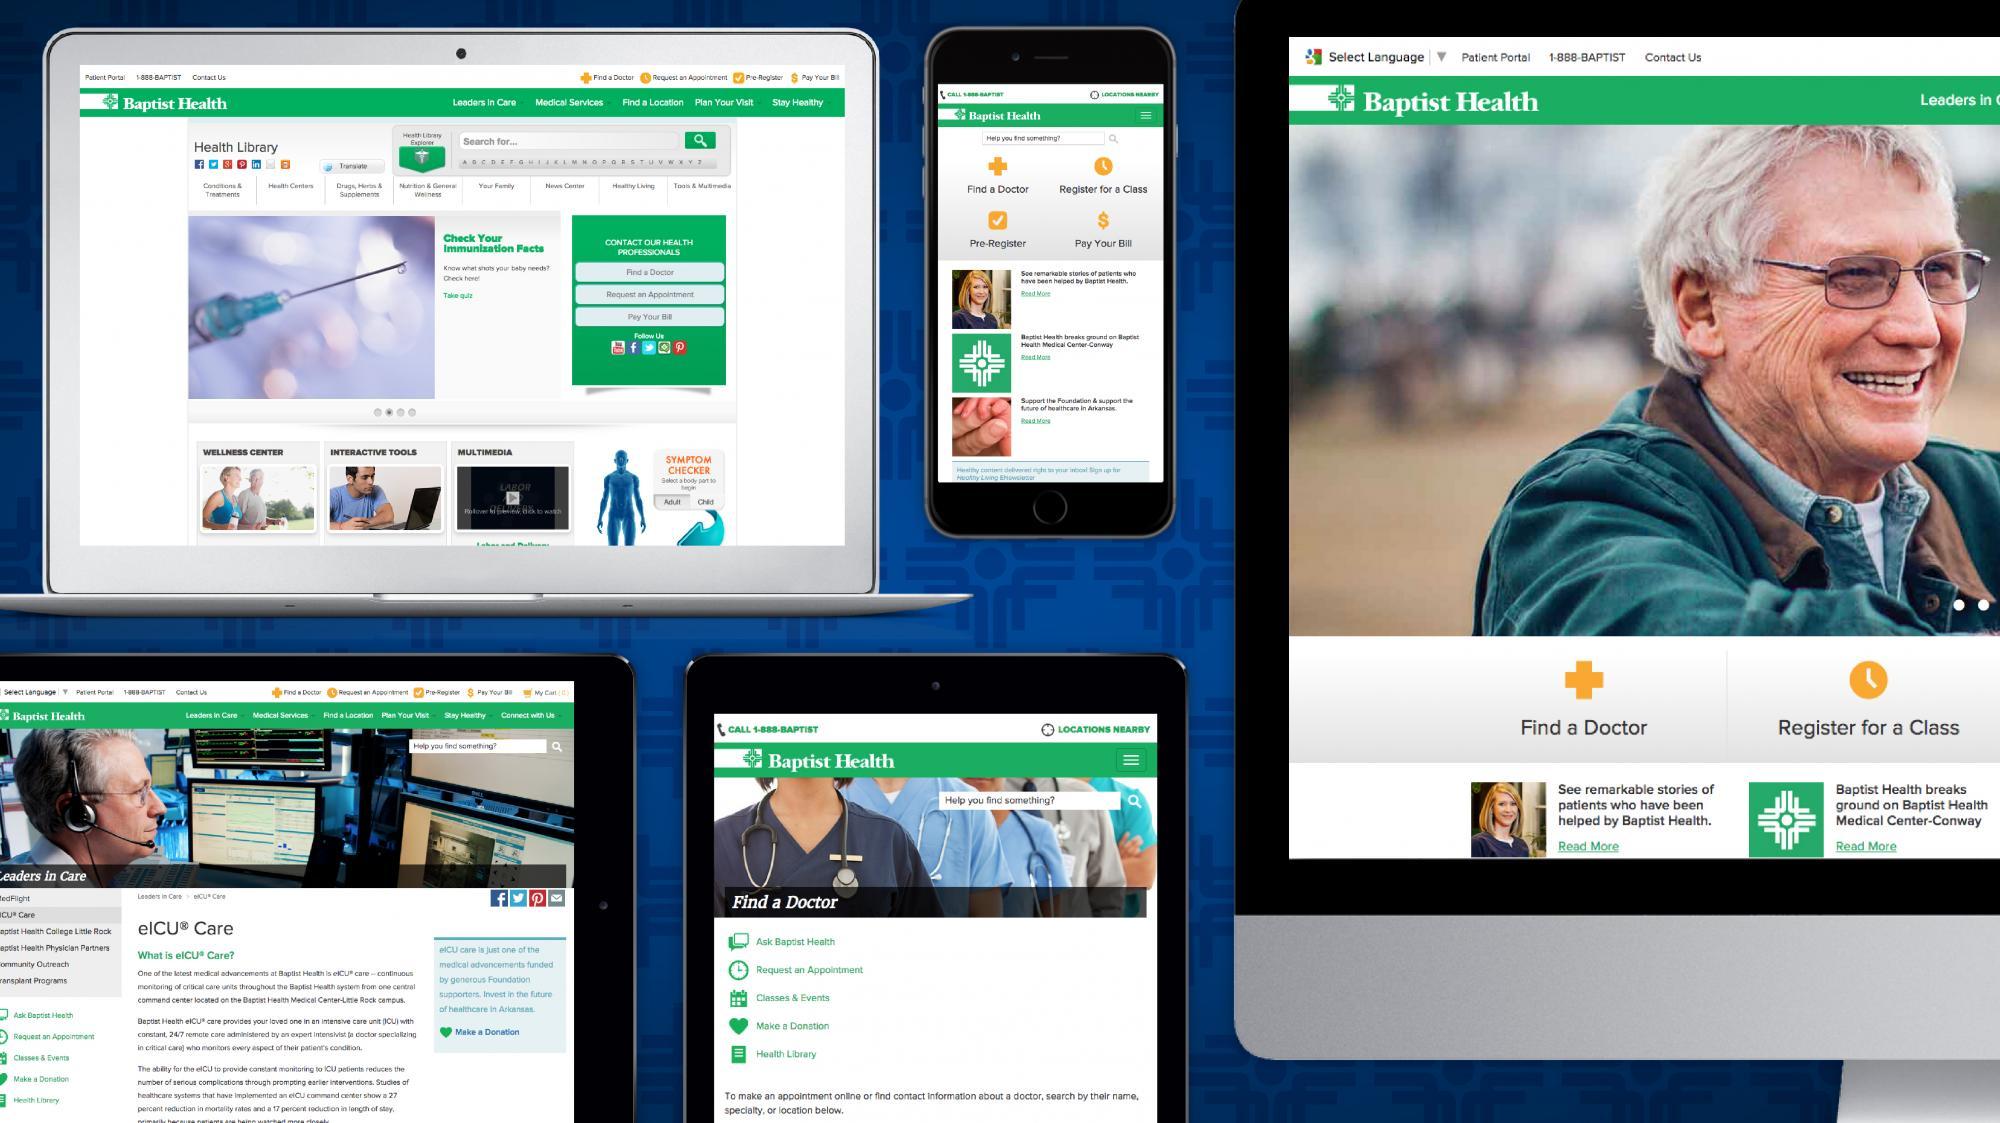 Baptist Health Website Pages Screenshots #1